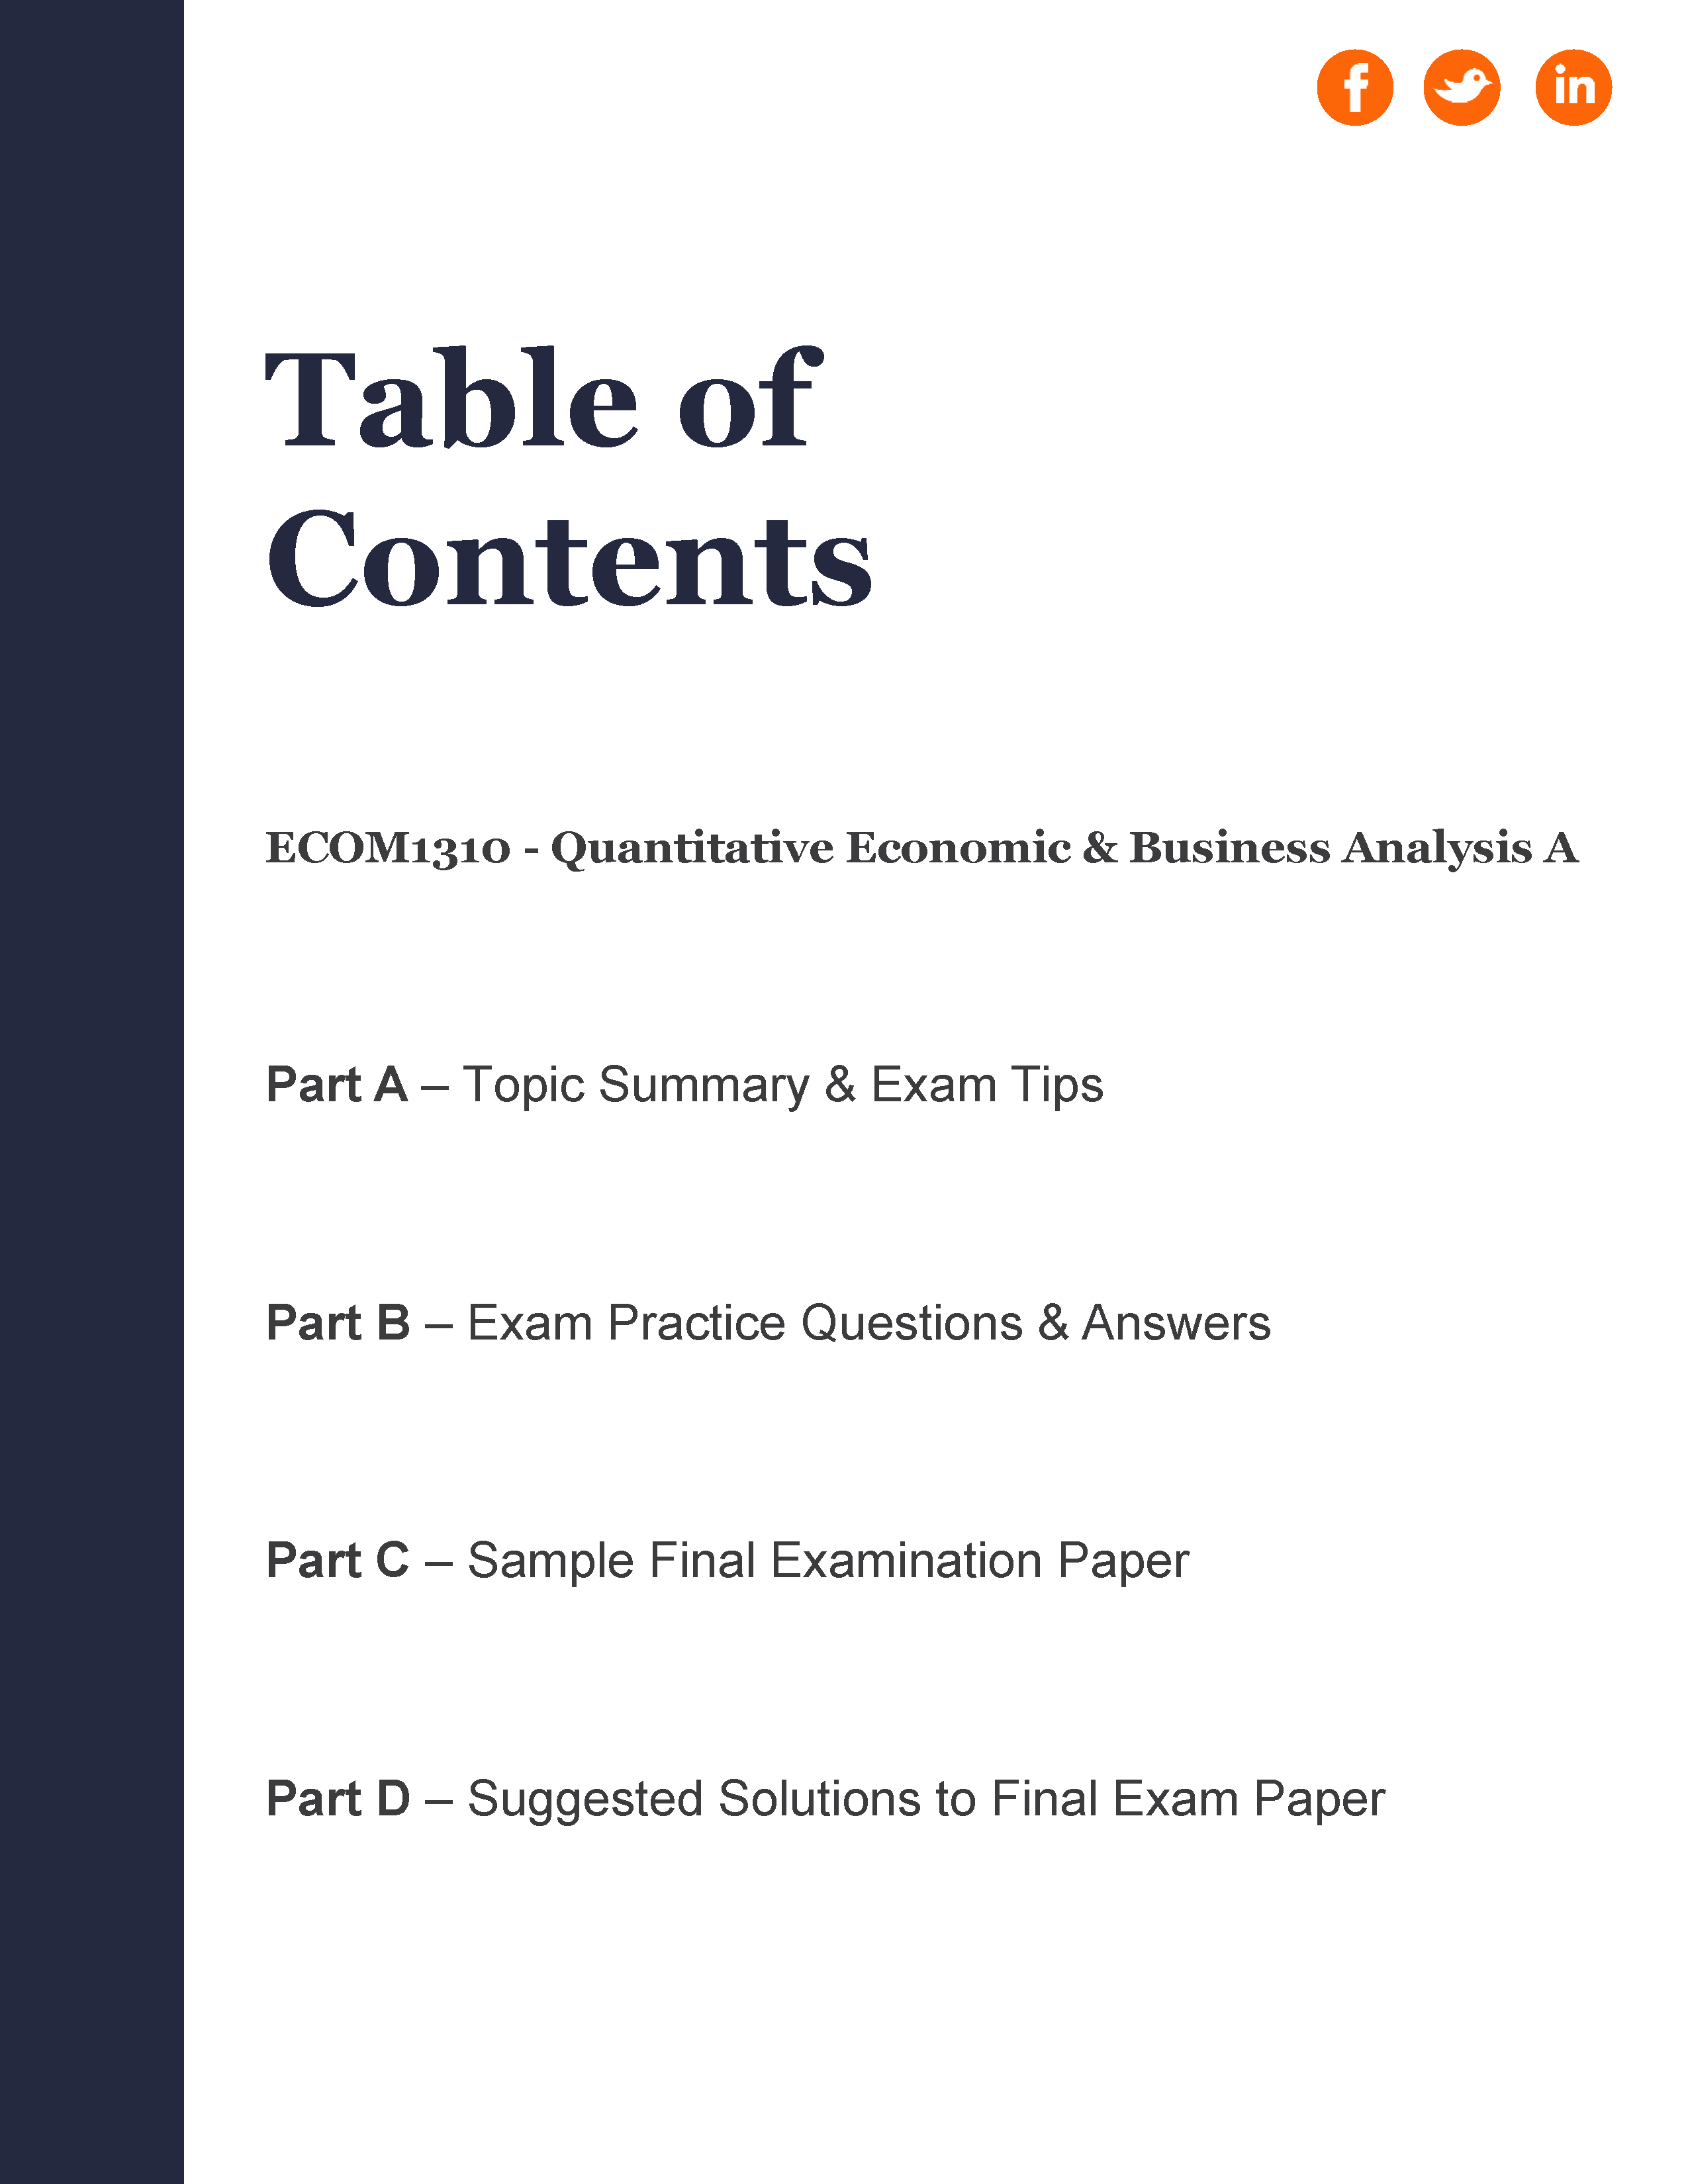 UQ - ECON1310: Quantitative Economic & Business Analysis A